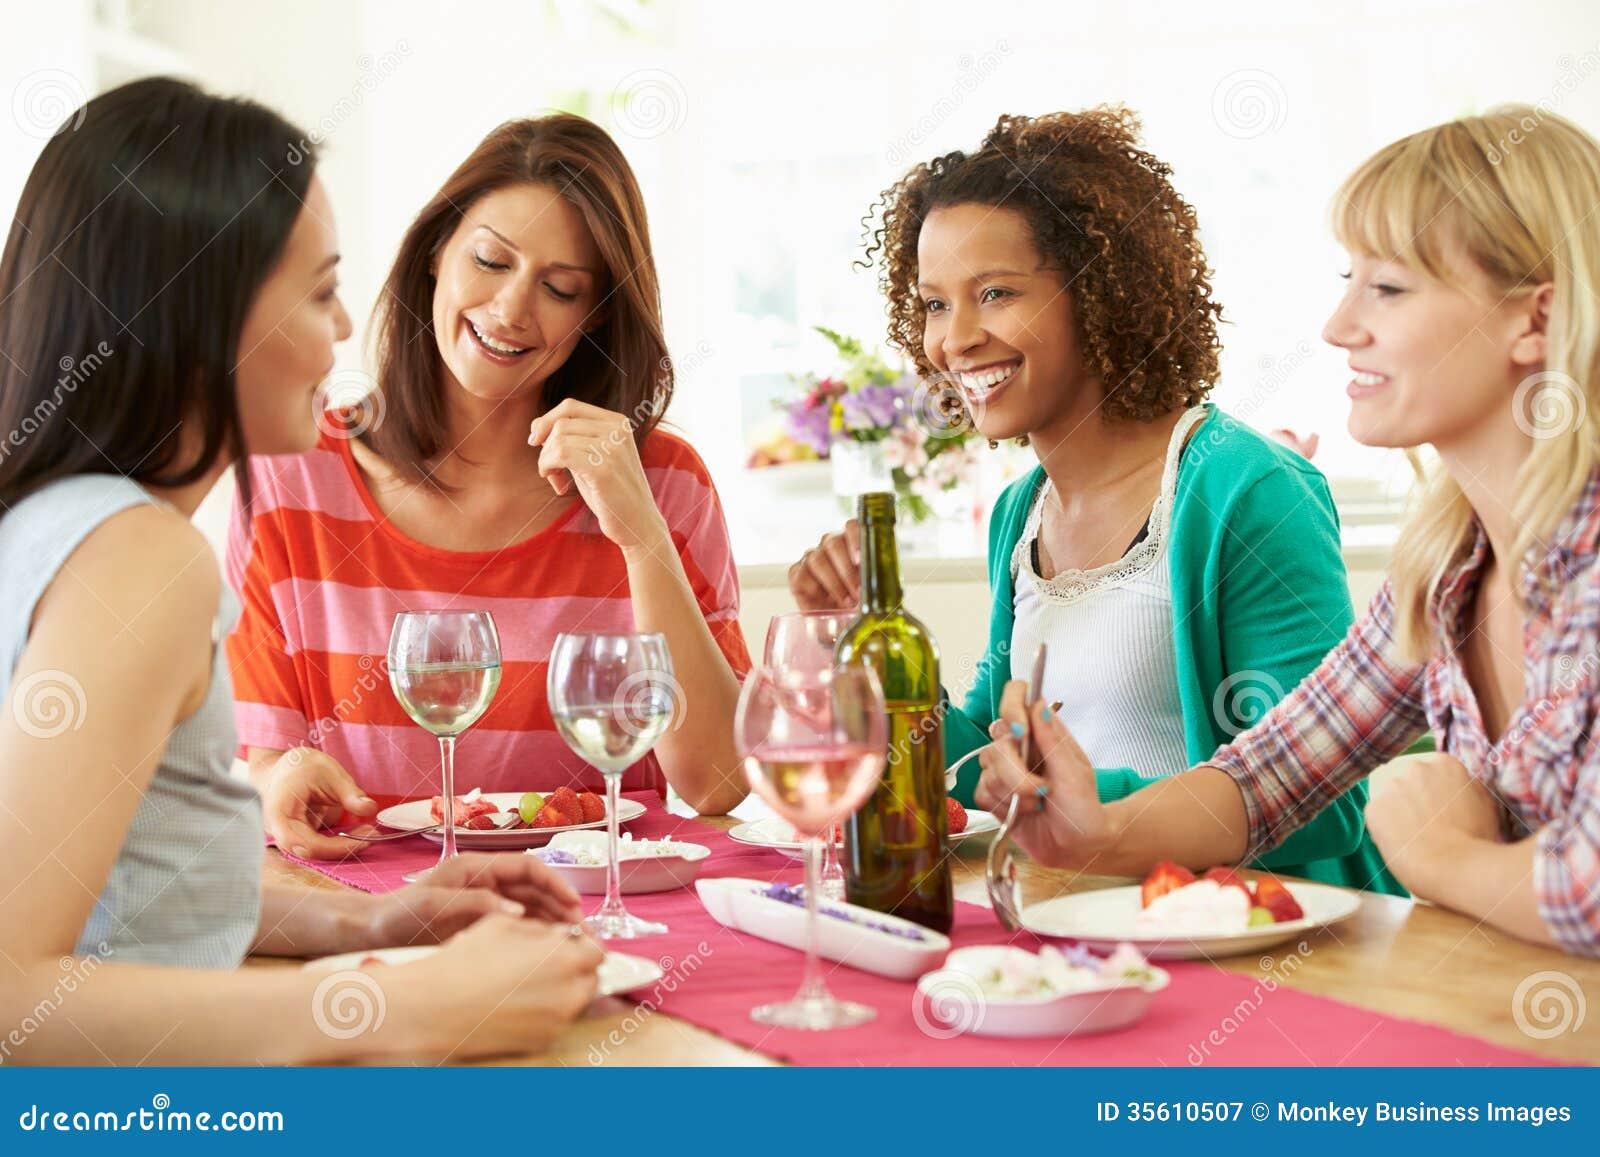 Group Of Women Sitting Around Table Eating Dessert Stock -8331